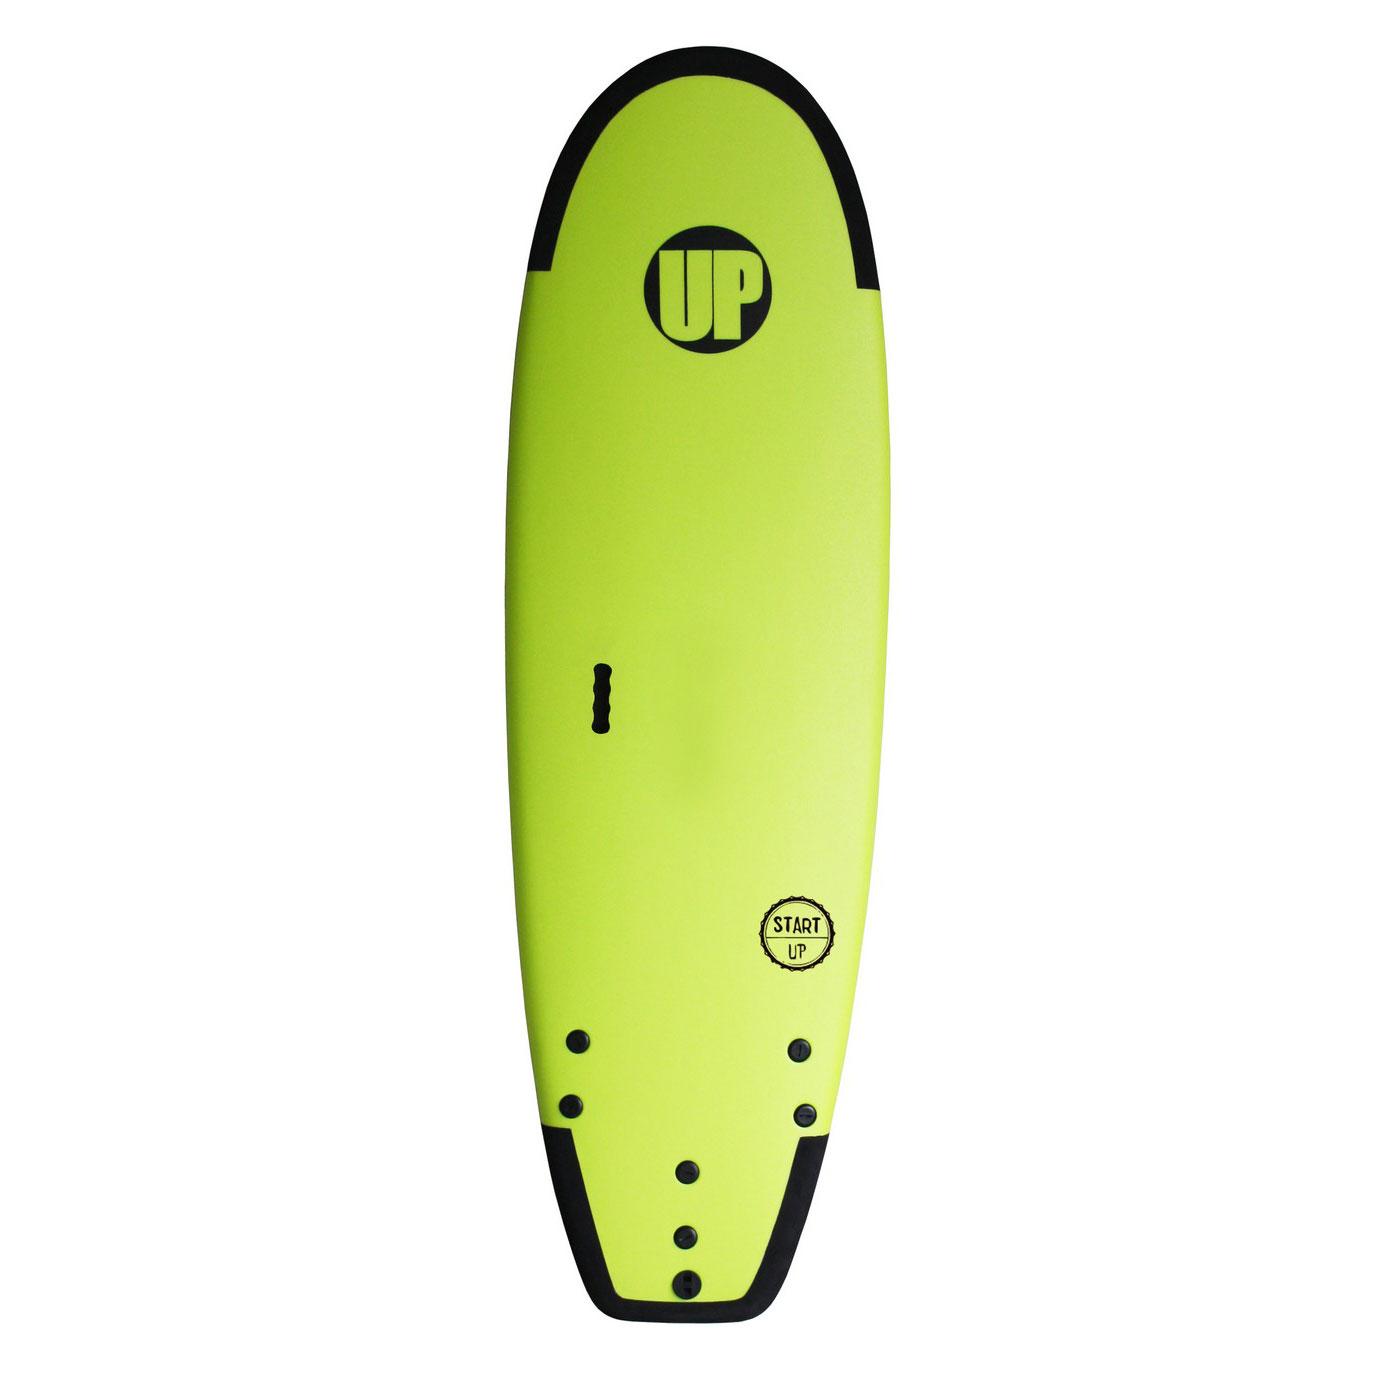 Start Up 6'. Tablas de Surf UP Surfboard.